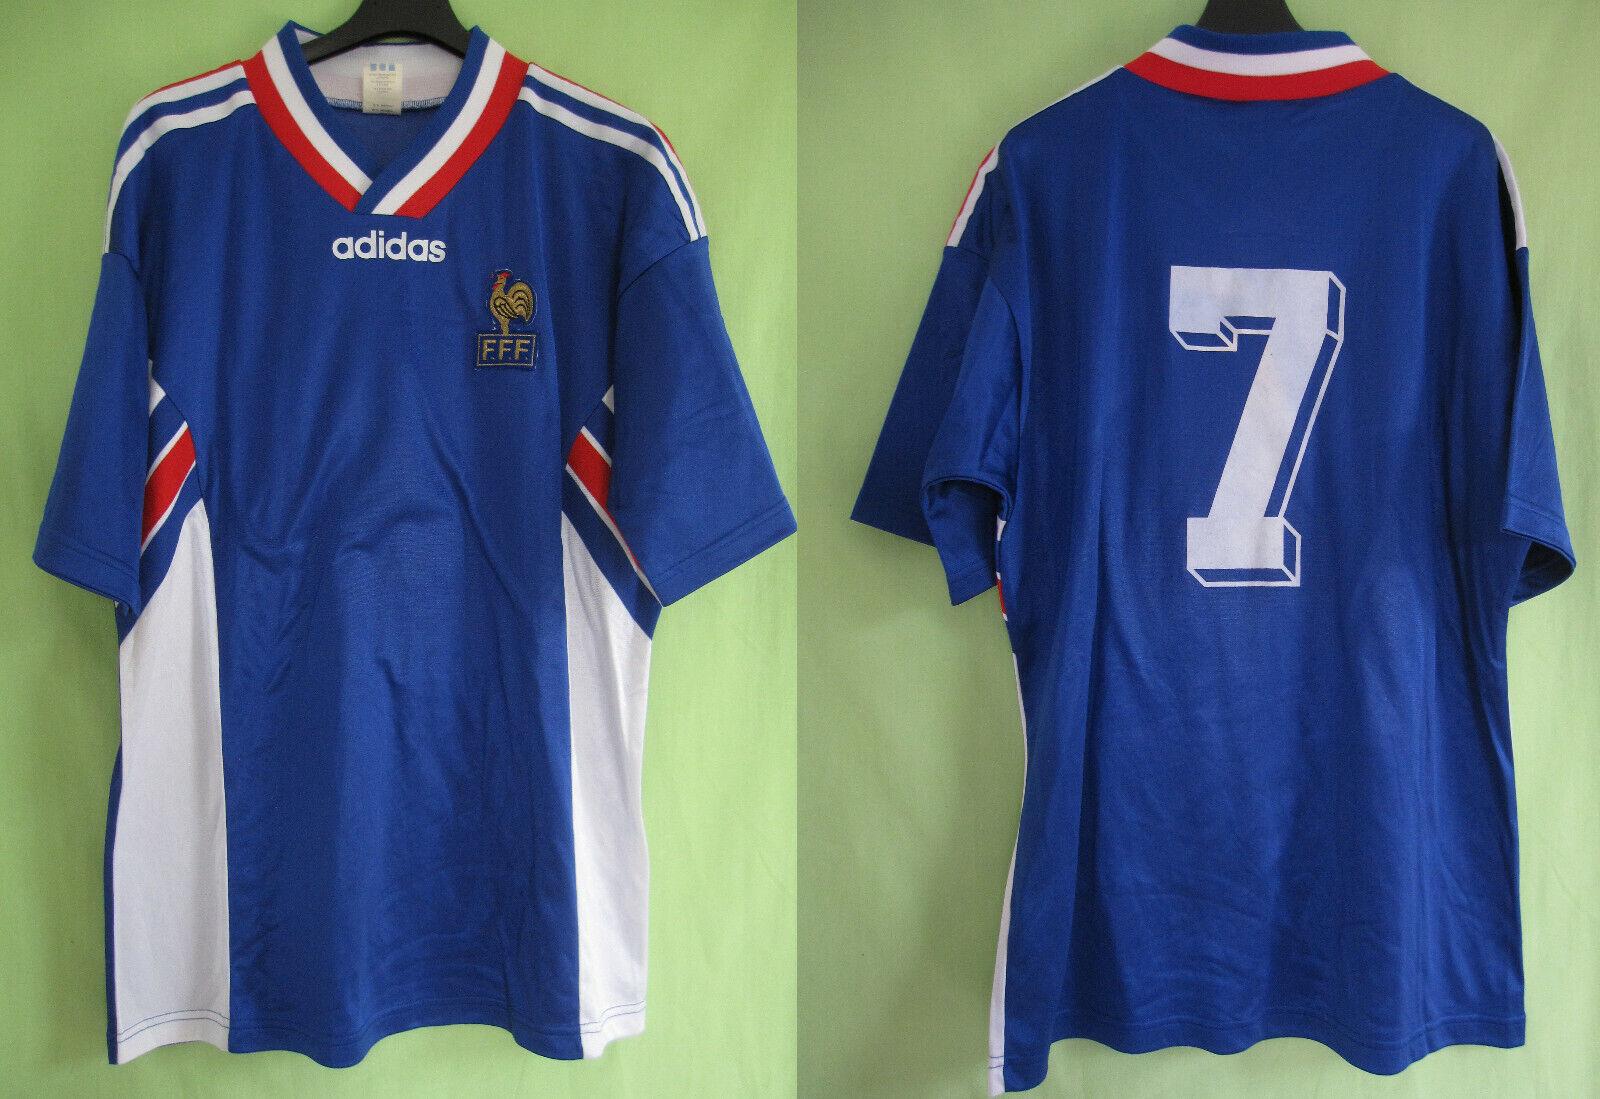 Maillot Equipe de France Ancien FFF Vintage Adidas Football Jersey - L